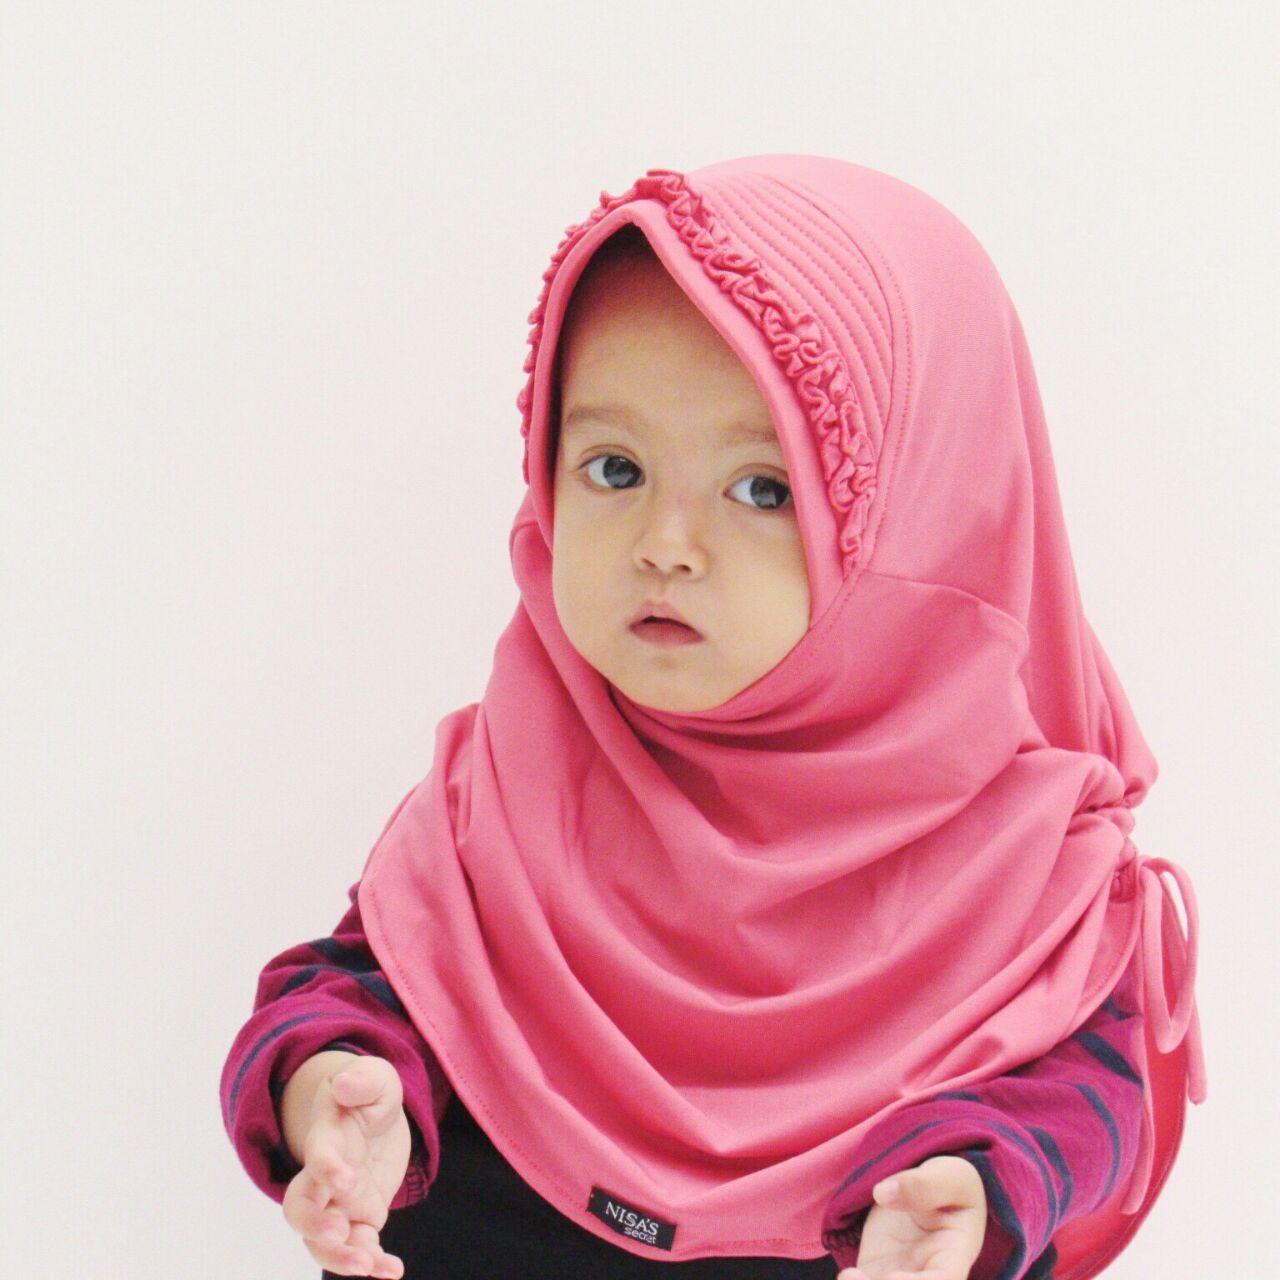 0812 2405 1465 Pusat Jilbab Anak Pusat Jilbab Anak Kecil